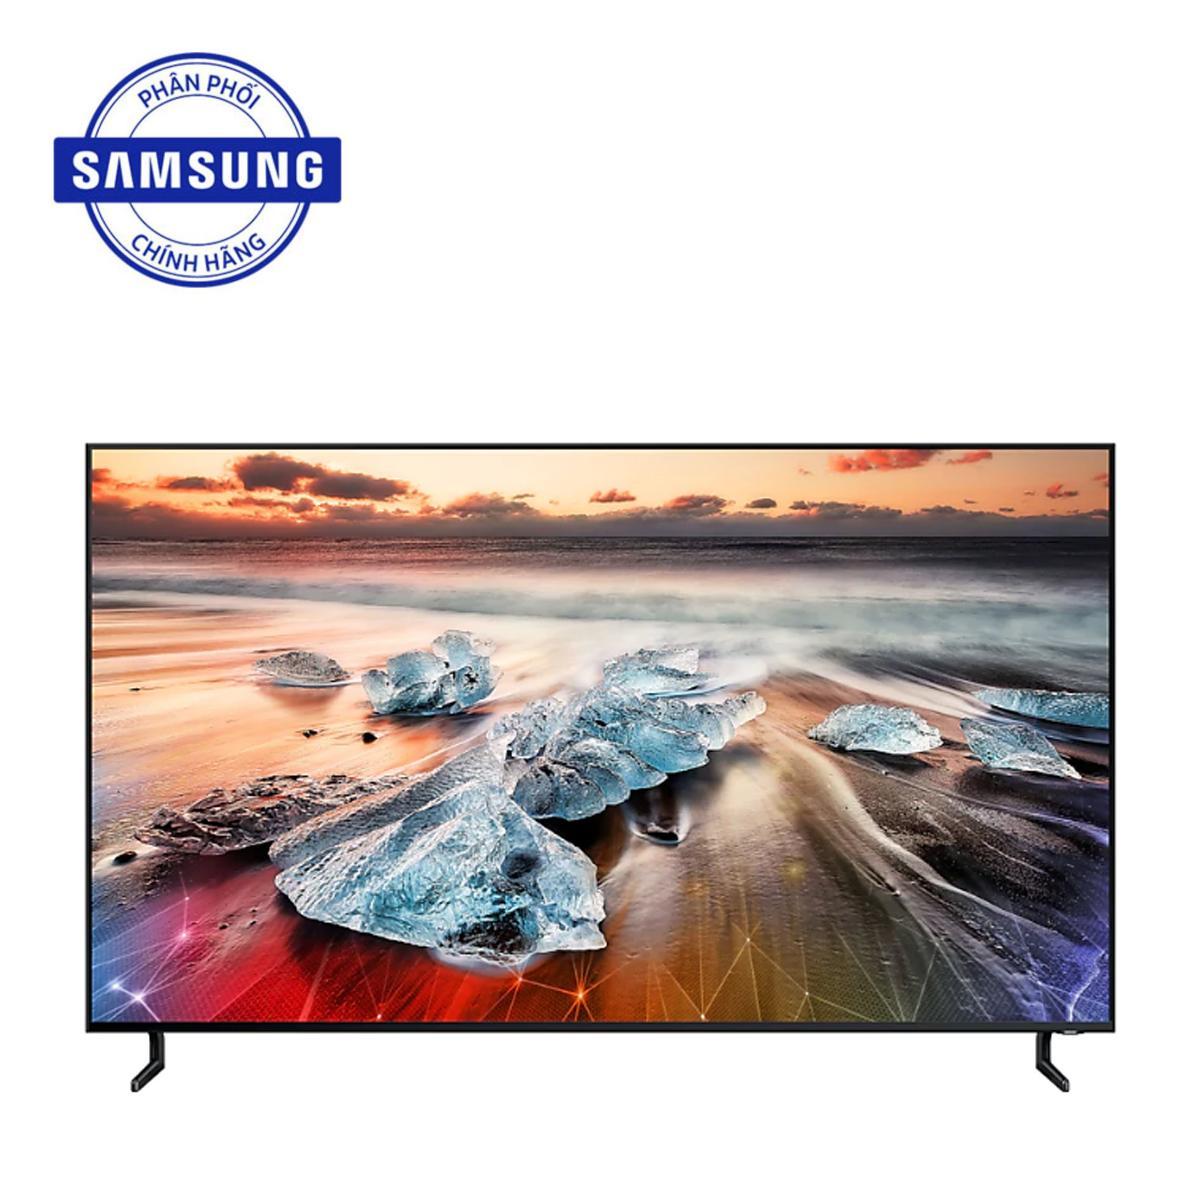 Smart TV 8K QLED 75 inch Q900R 2019